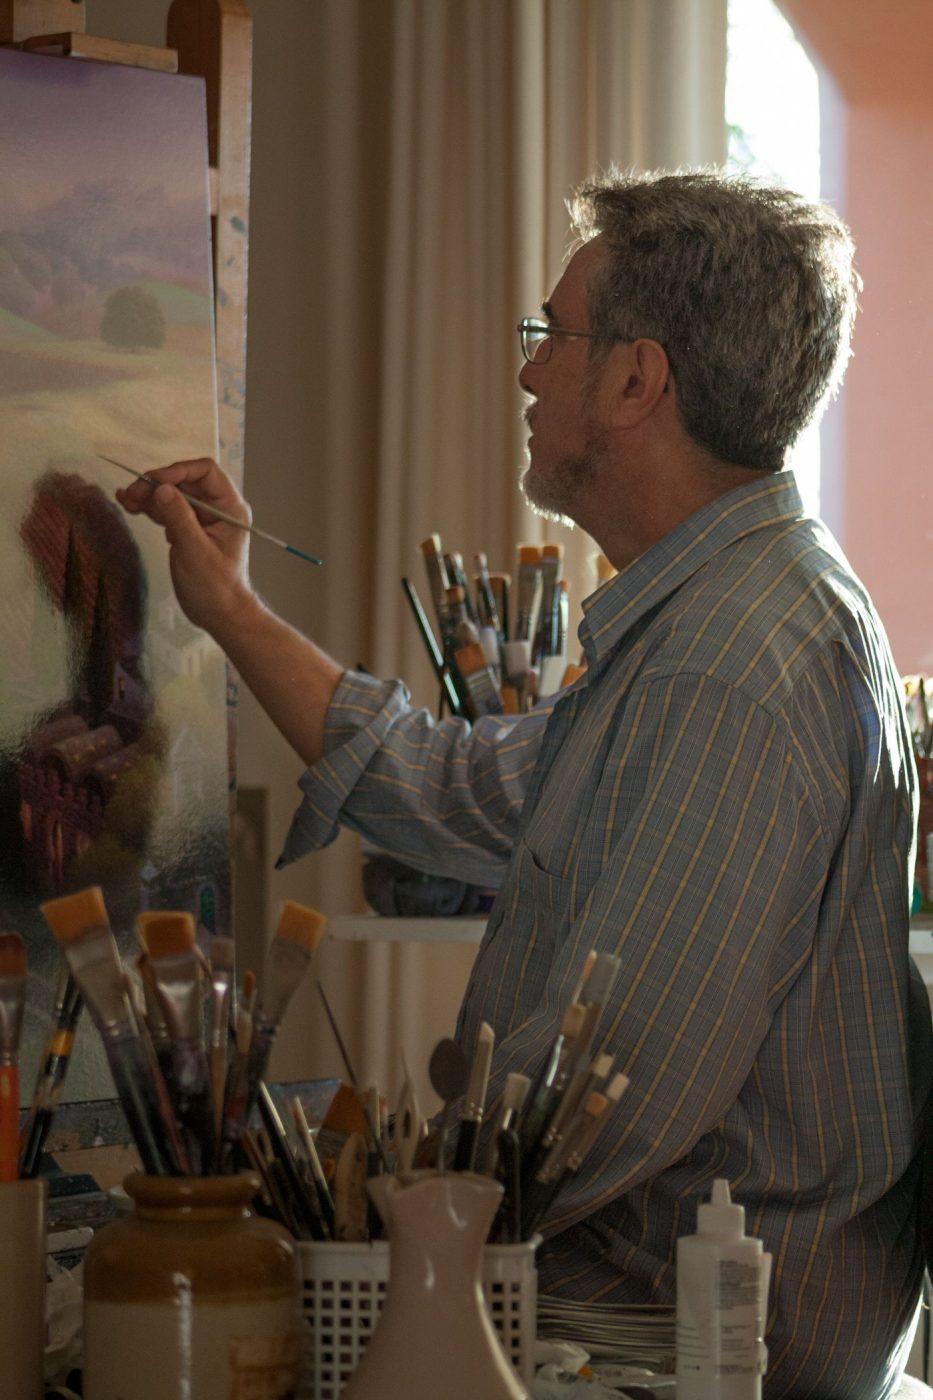 Luis Romero pintando